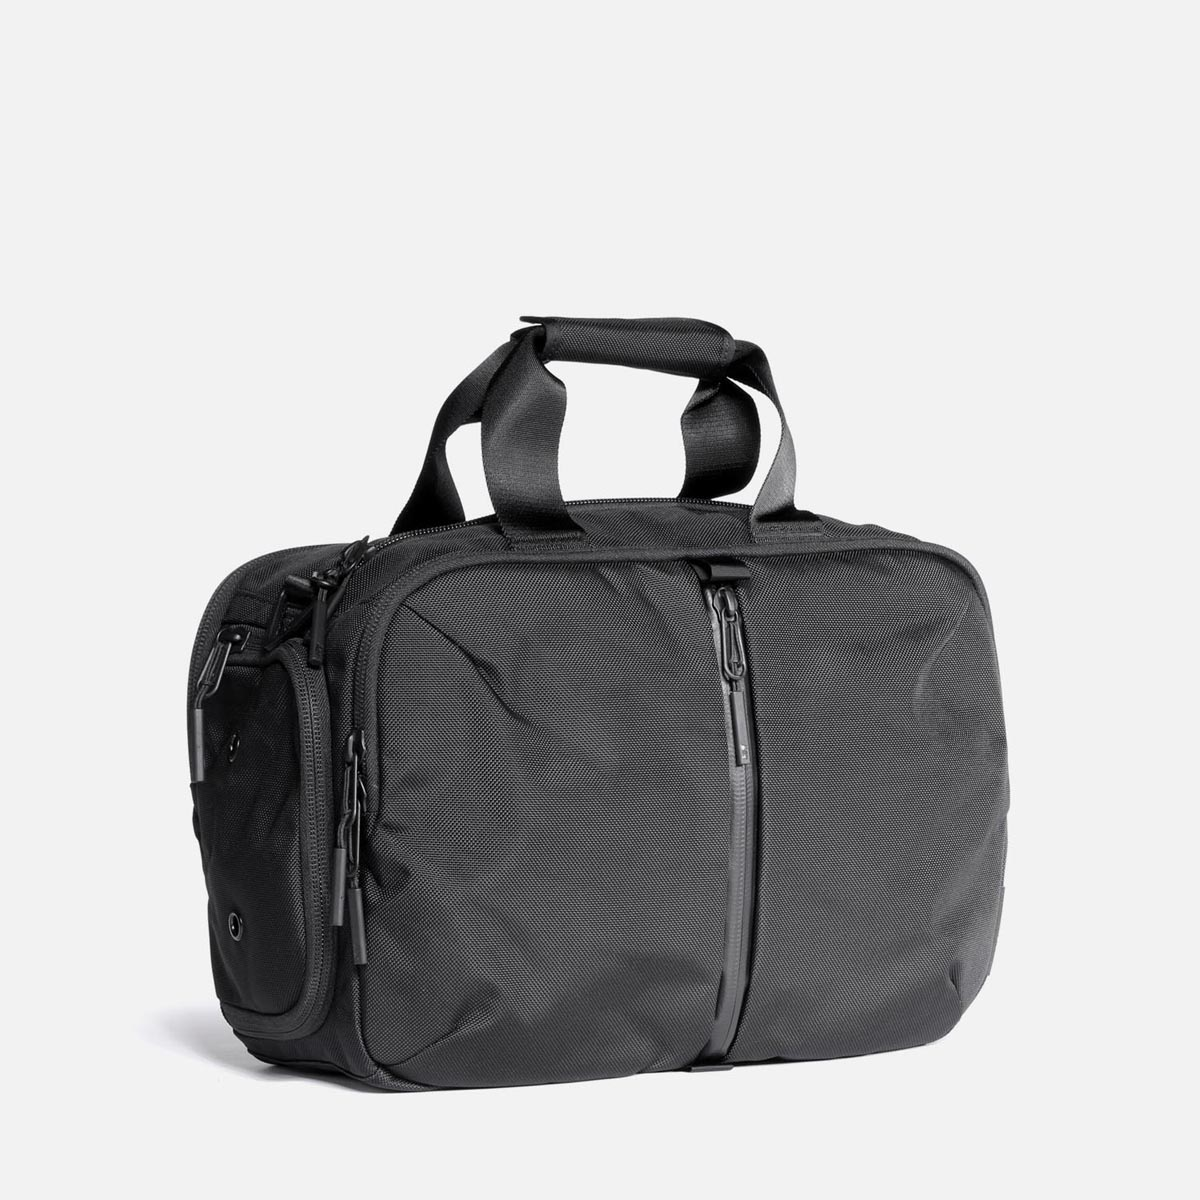 Bag Backpack High Capacity Sports Backpacks,Laptop Bag Padded Duffle Bag Travel Bag for Women and Men